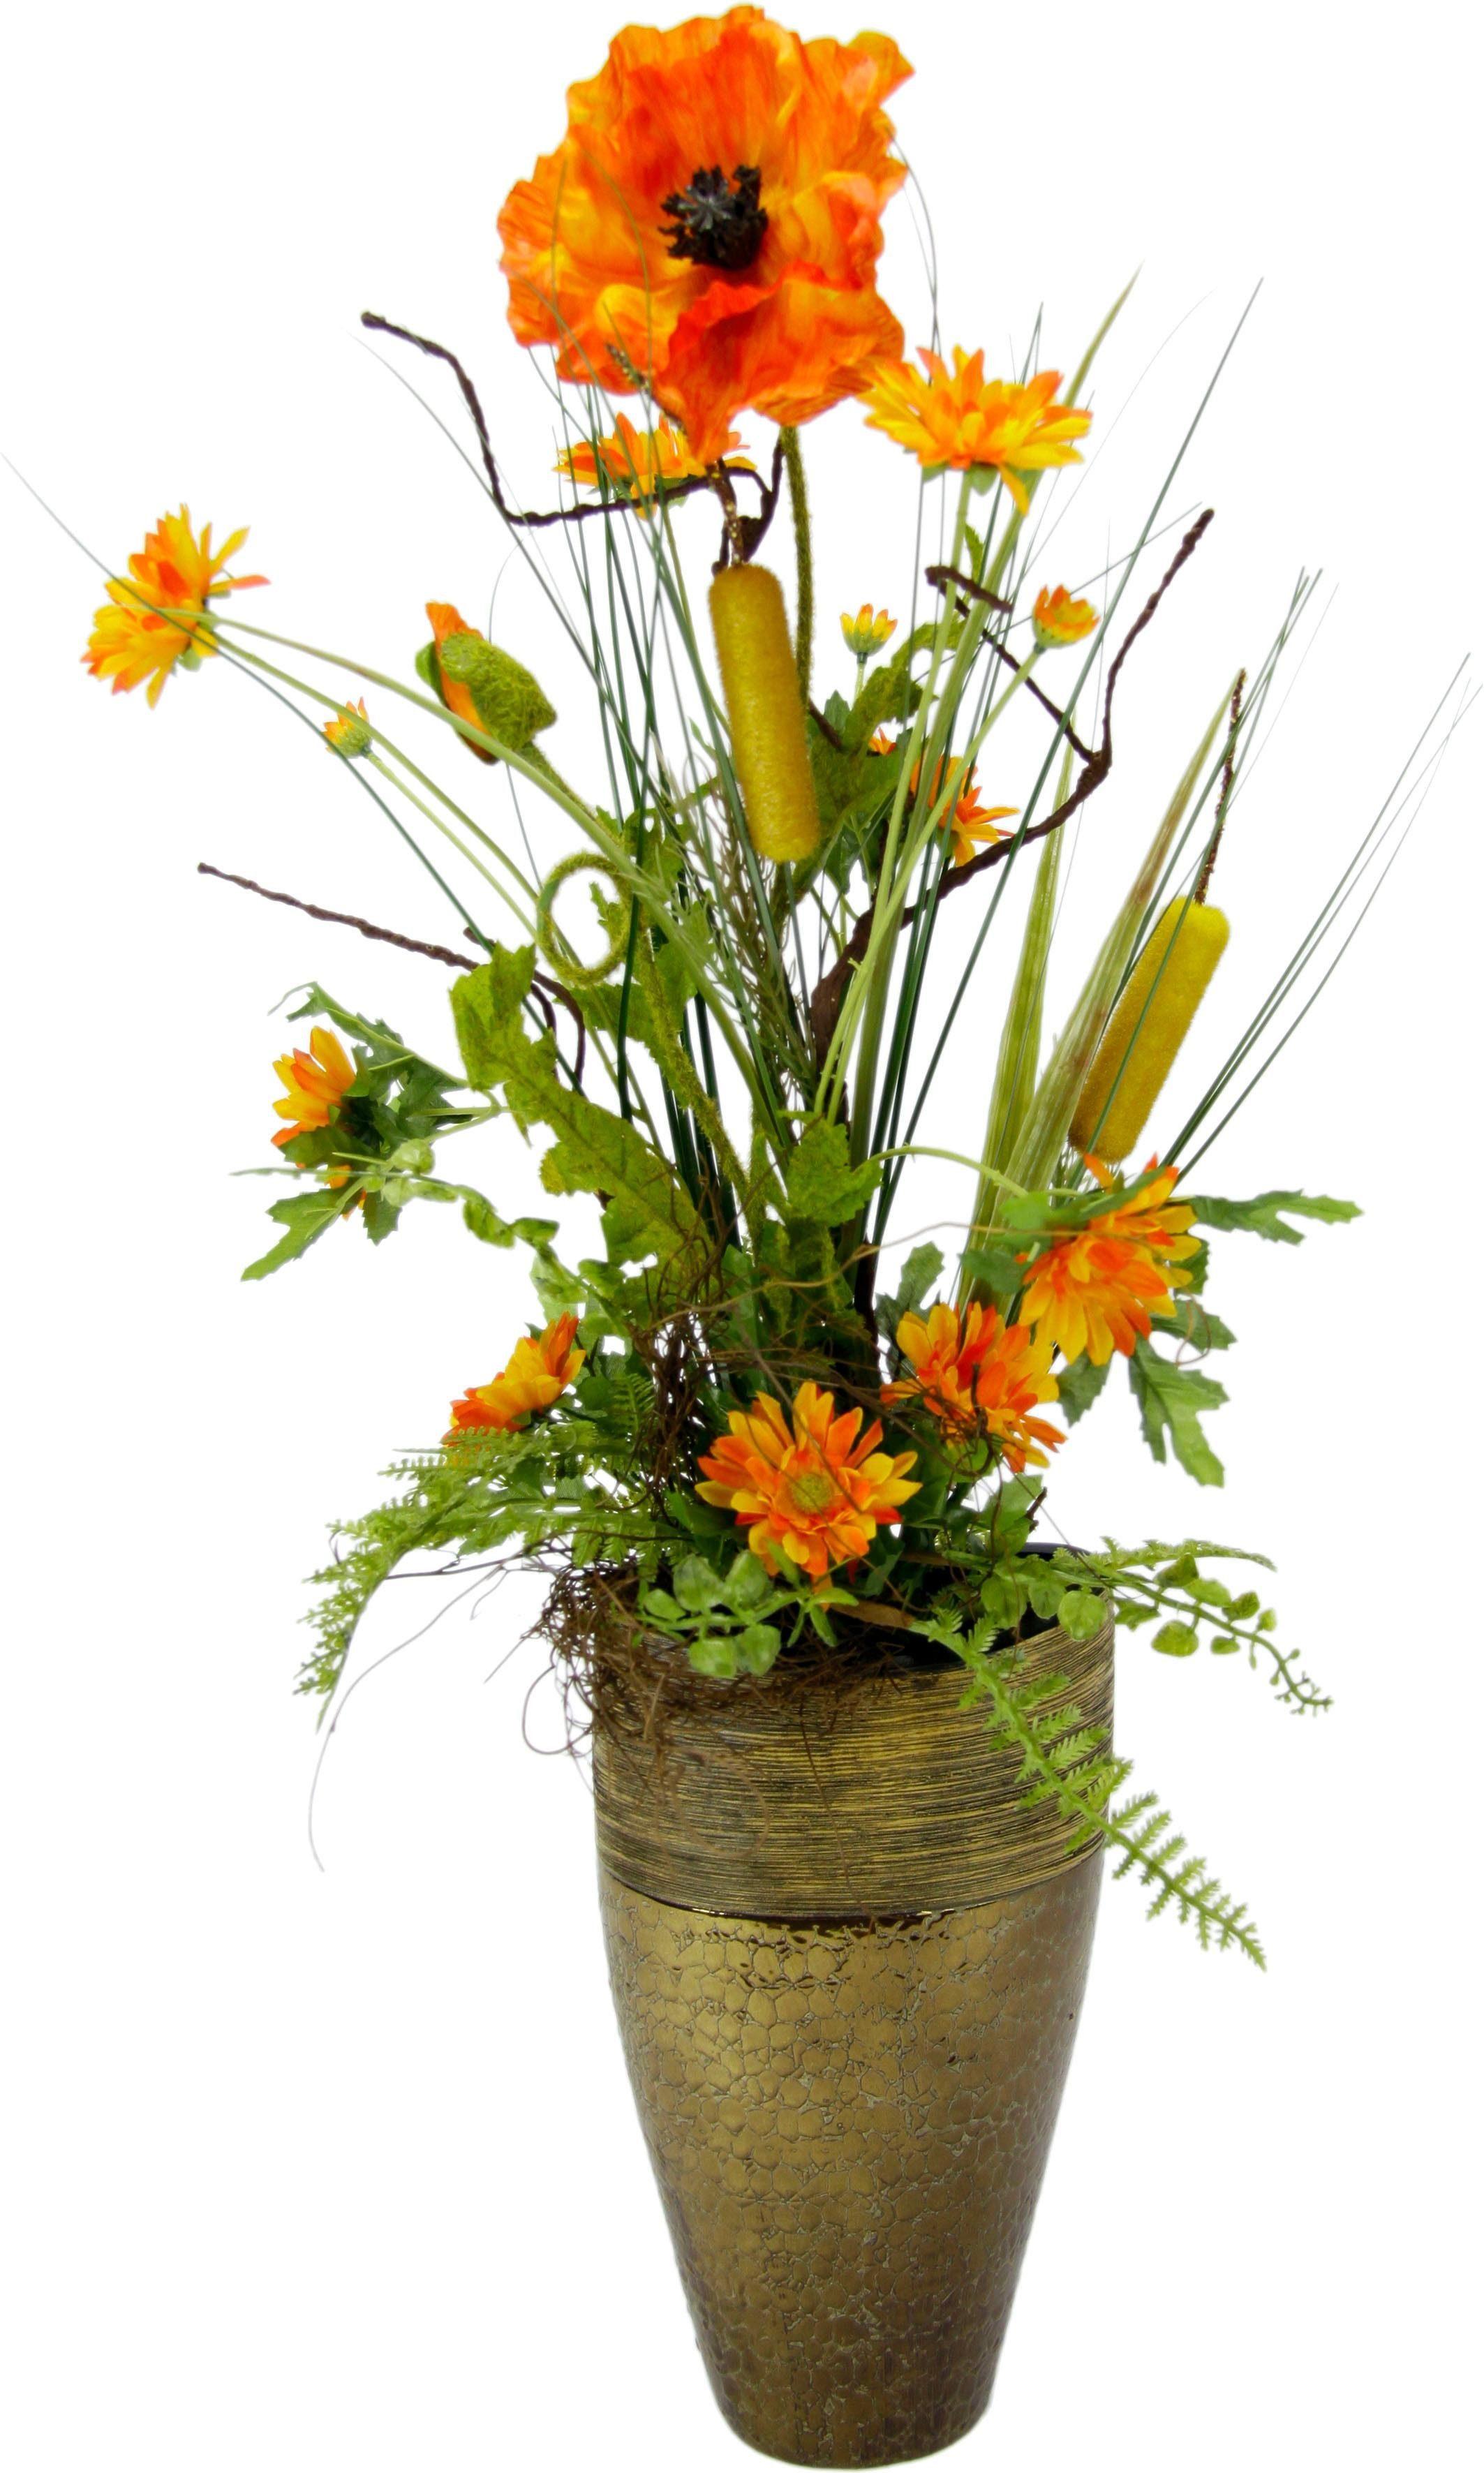 Kunstblume Gesteck Mohn/Rohrkolben in Vase